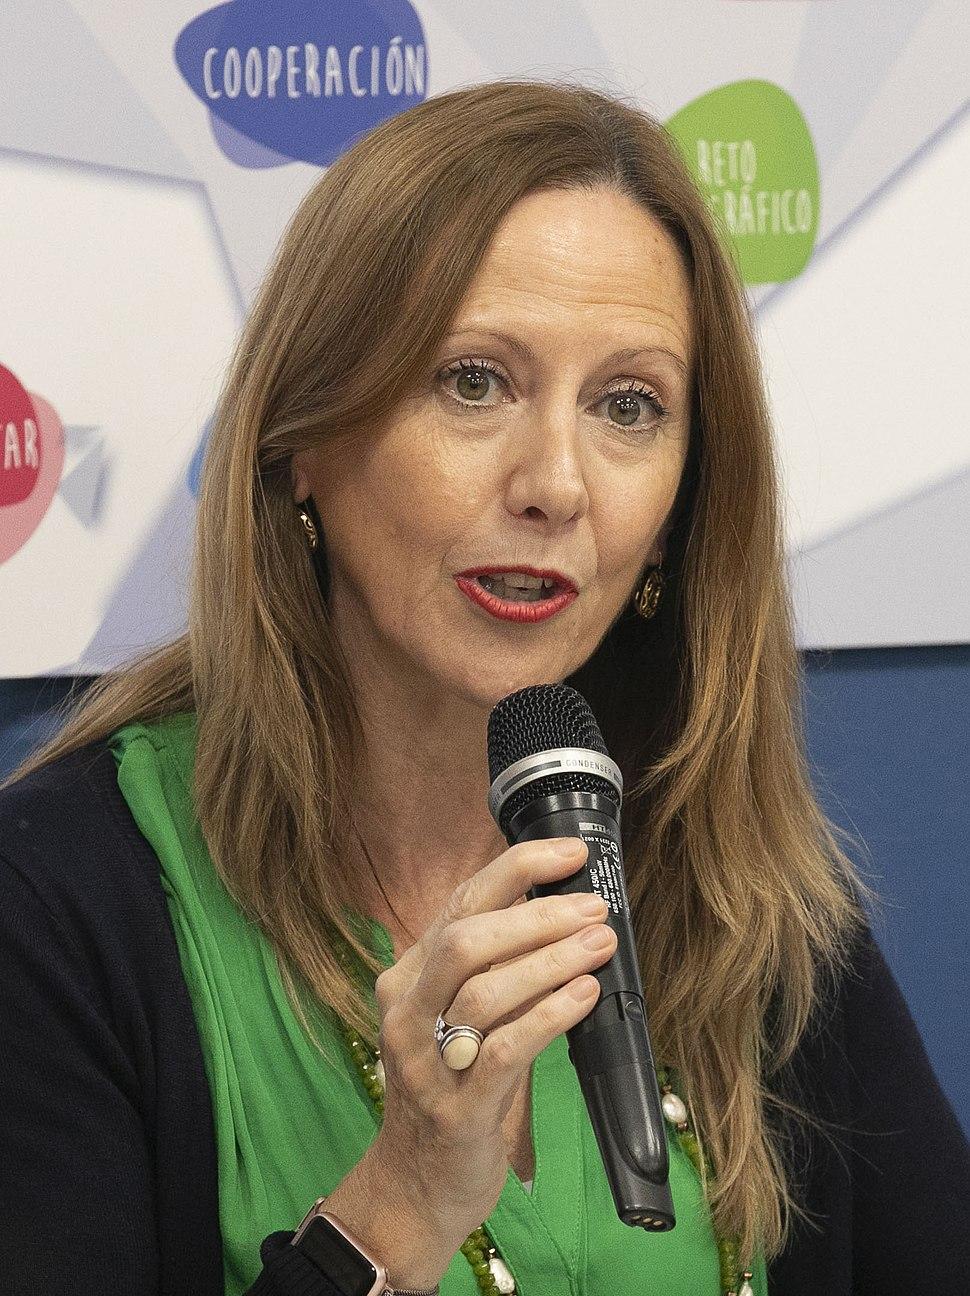 (Marta González Vázquez) Reunión Foro Social Partido Popular en sede distrito Salamanca contra la violencia de género. (44167499810) (cropped)